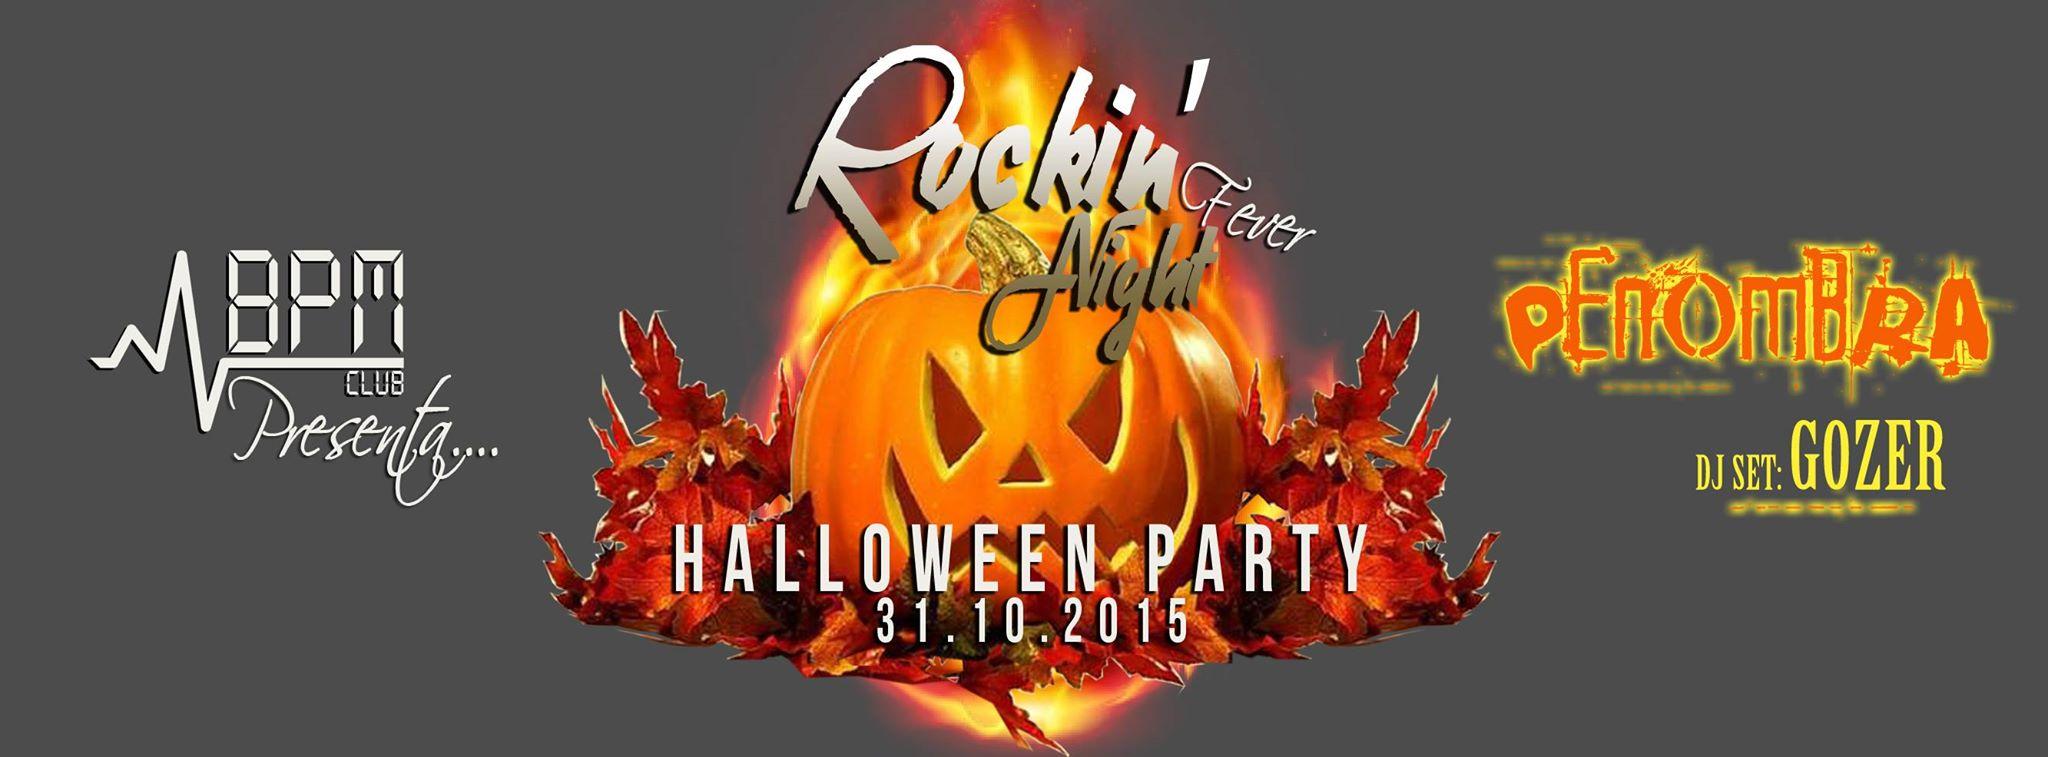 Rockin' night fever – Halloween Party